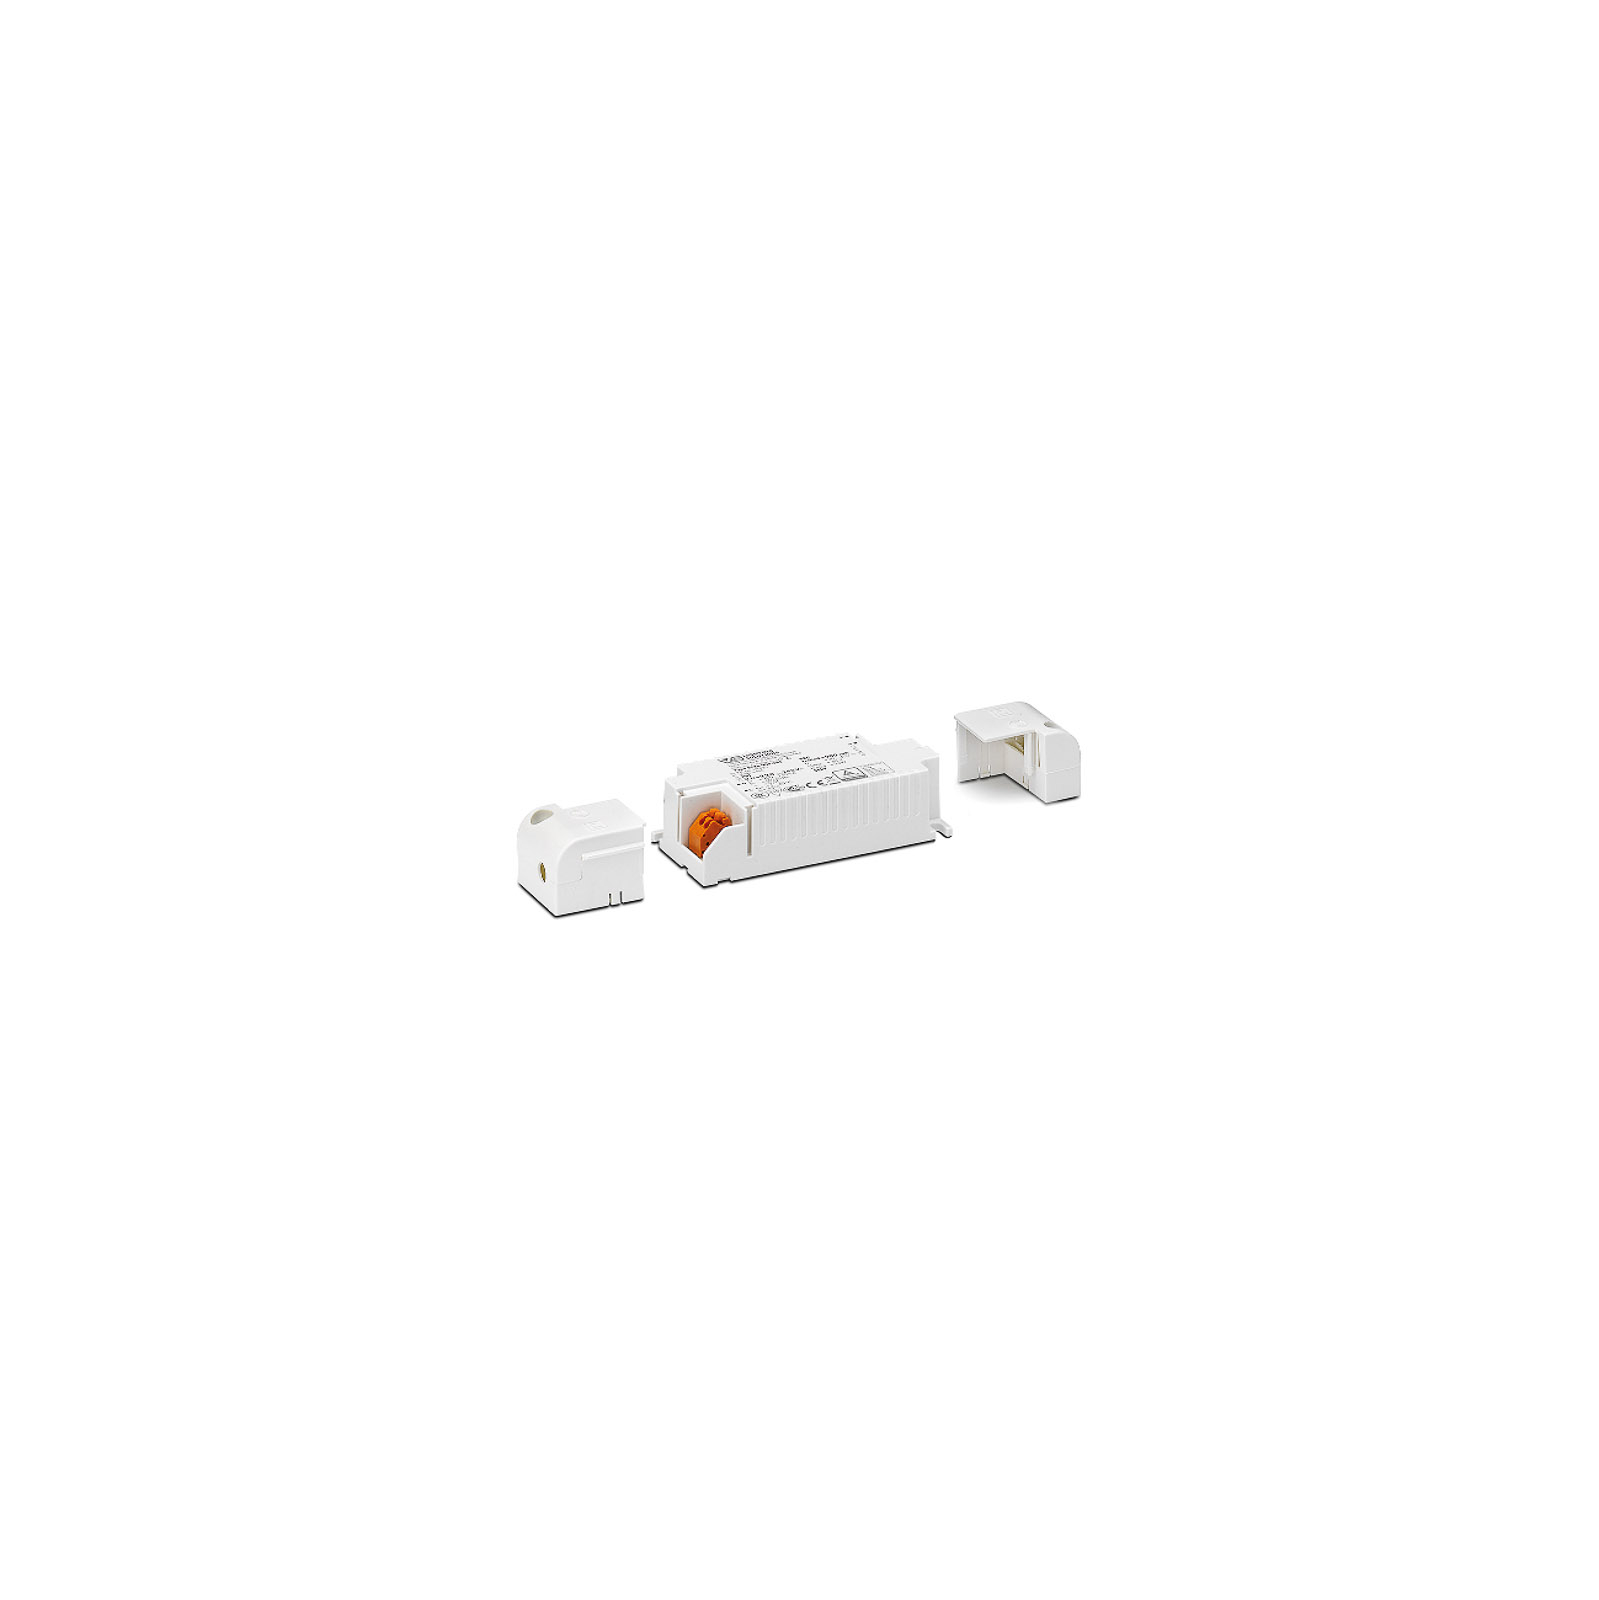 Driver LED max. 28W, 30-40V DC, 700mA